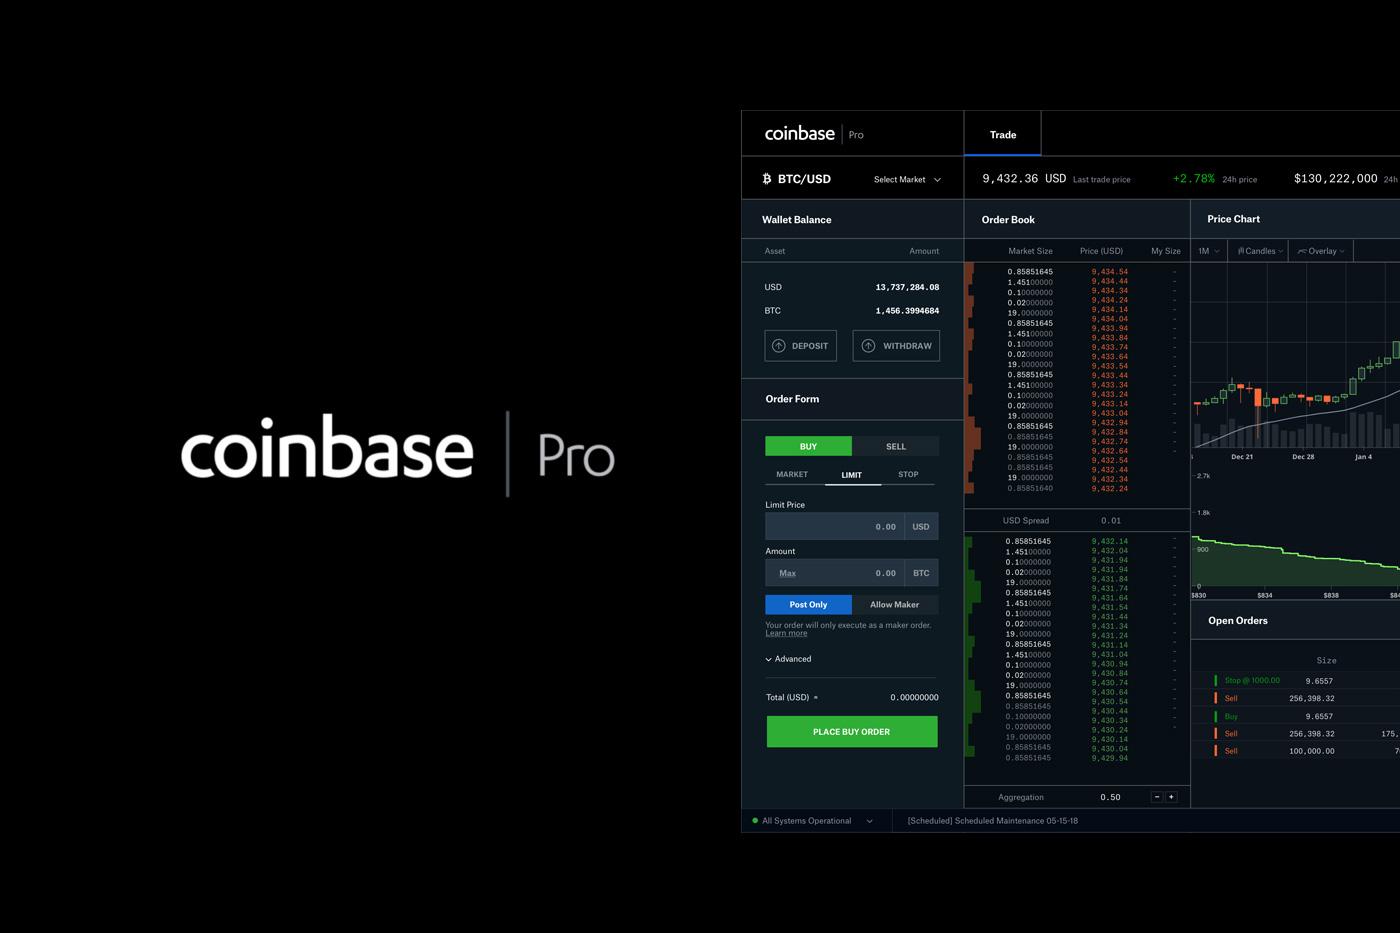 Coinbase Pro criptovalute